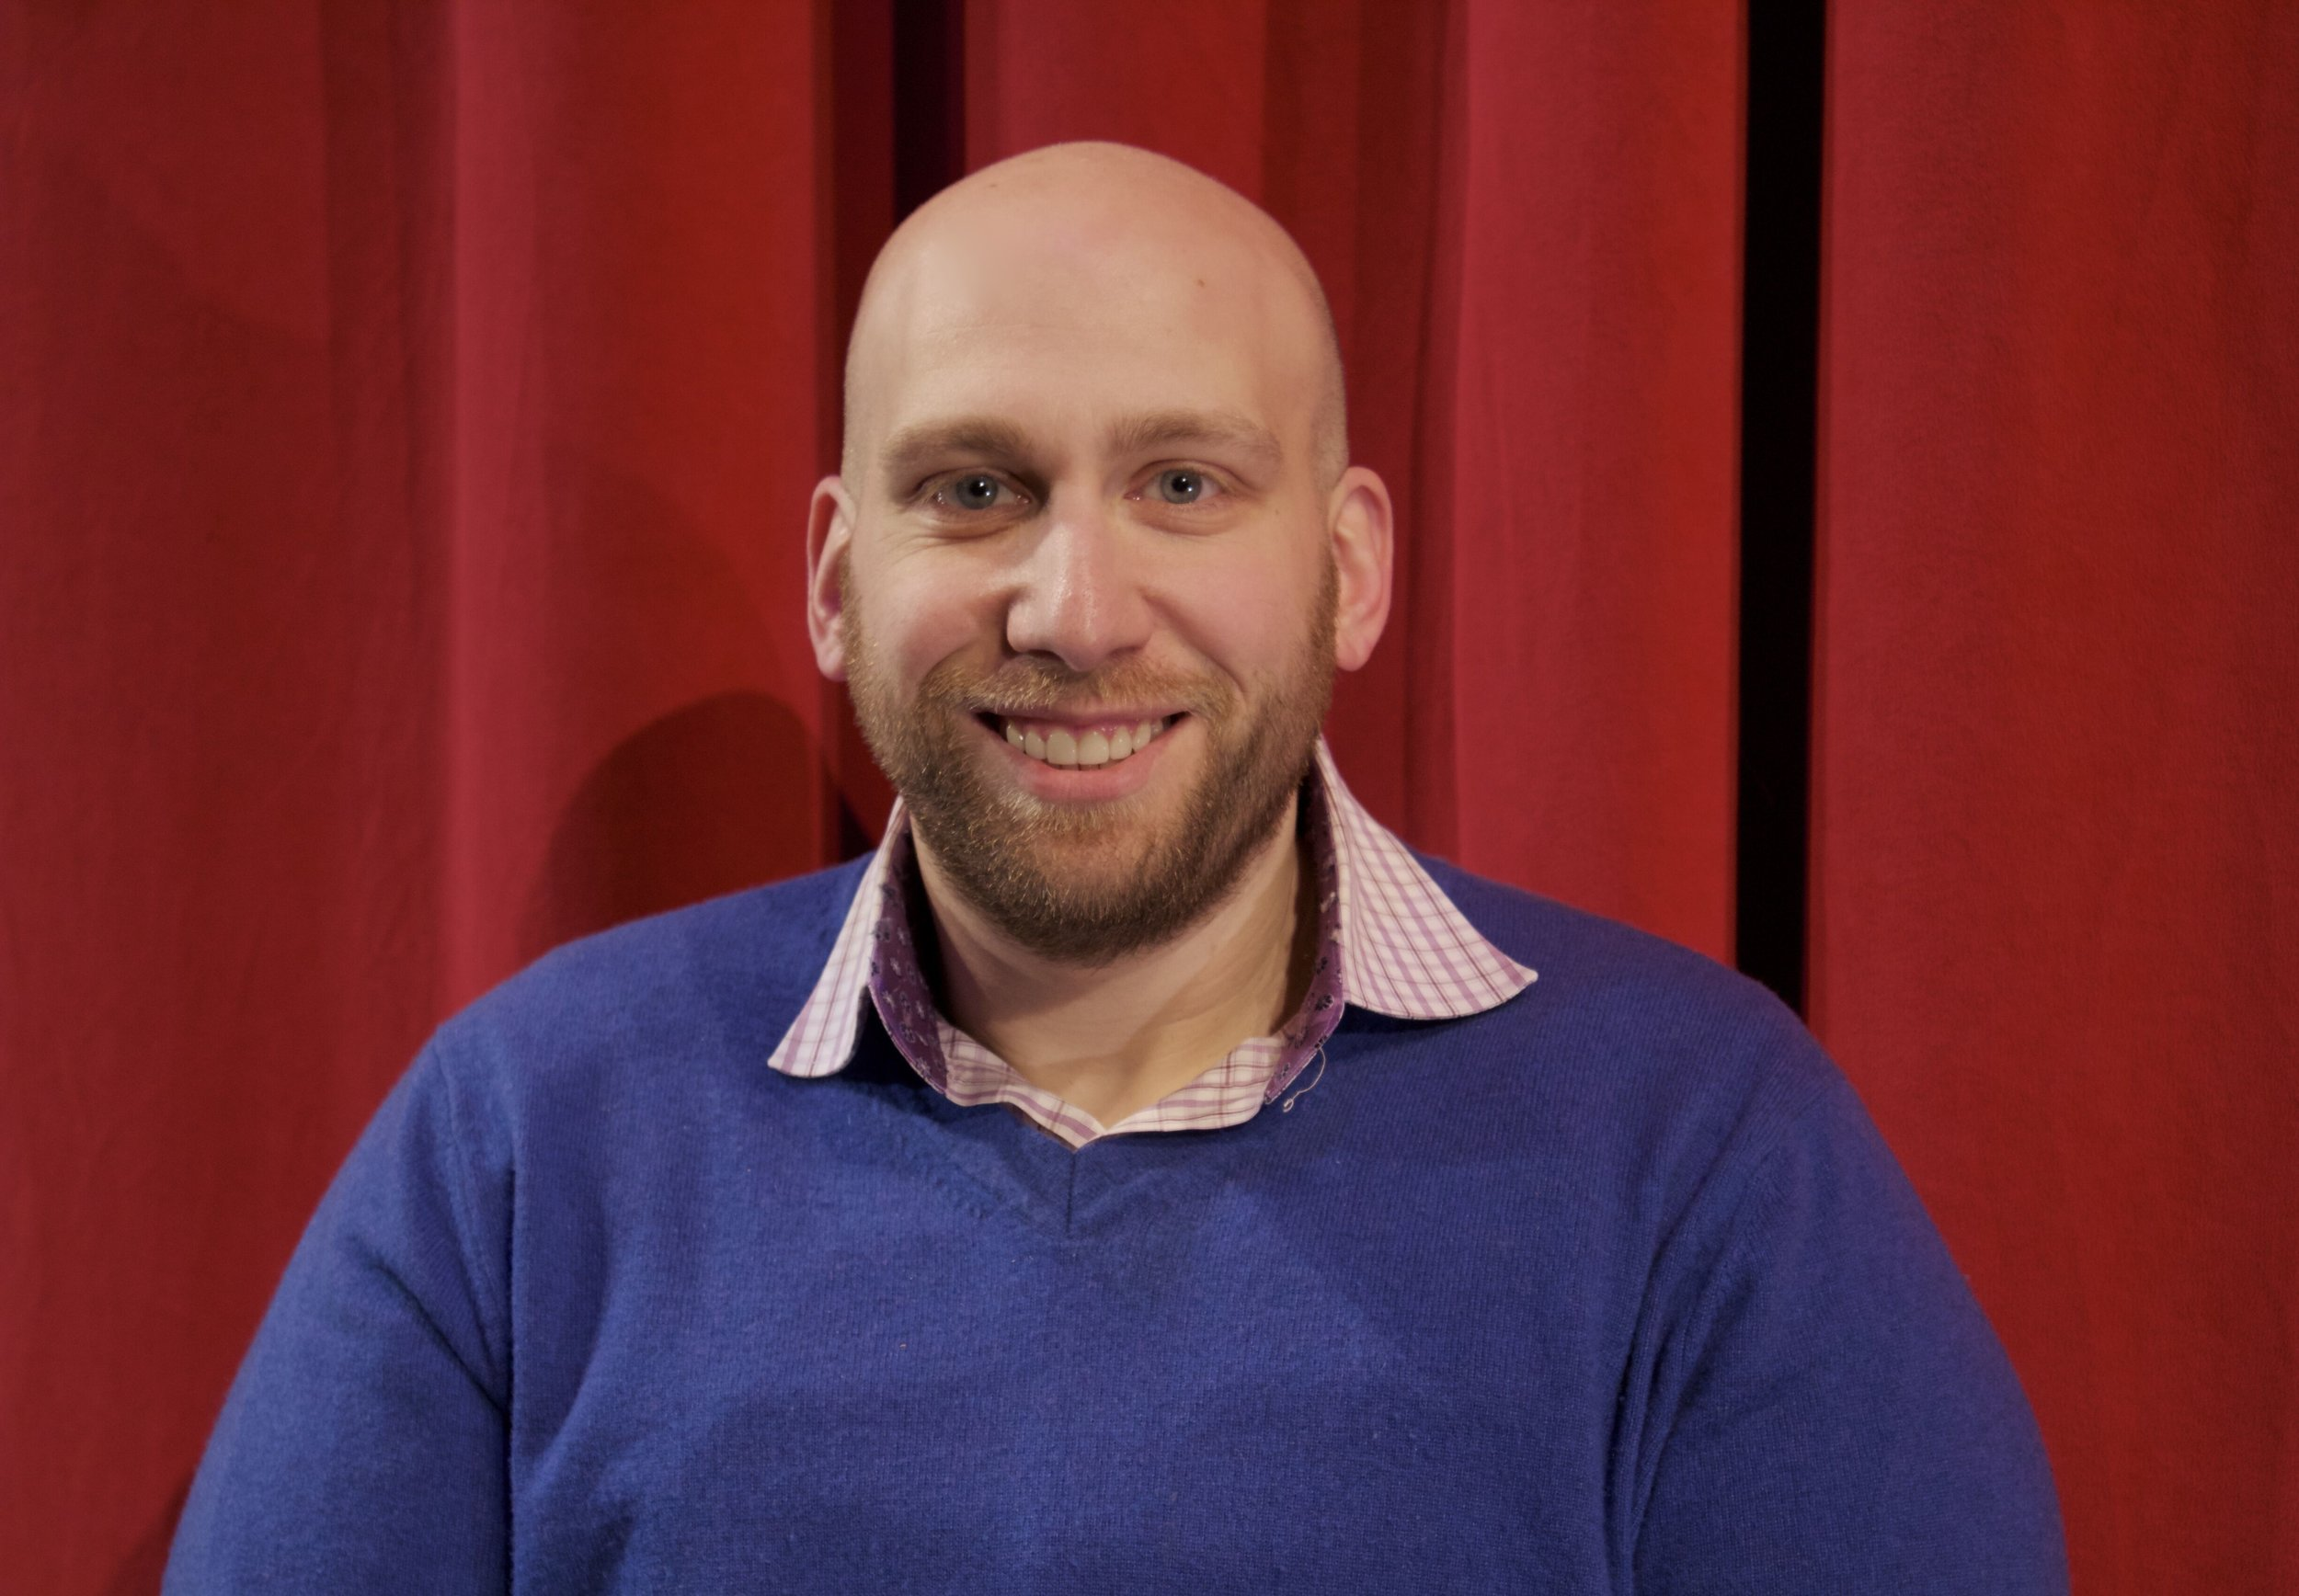 Andrew Greenblatt